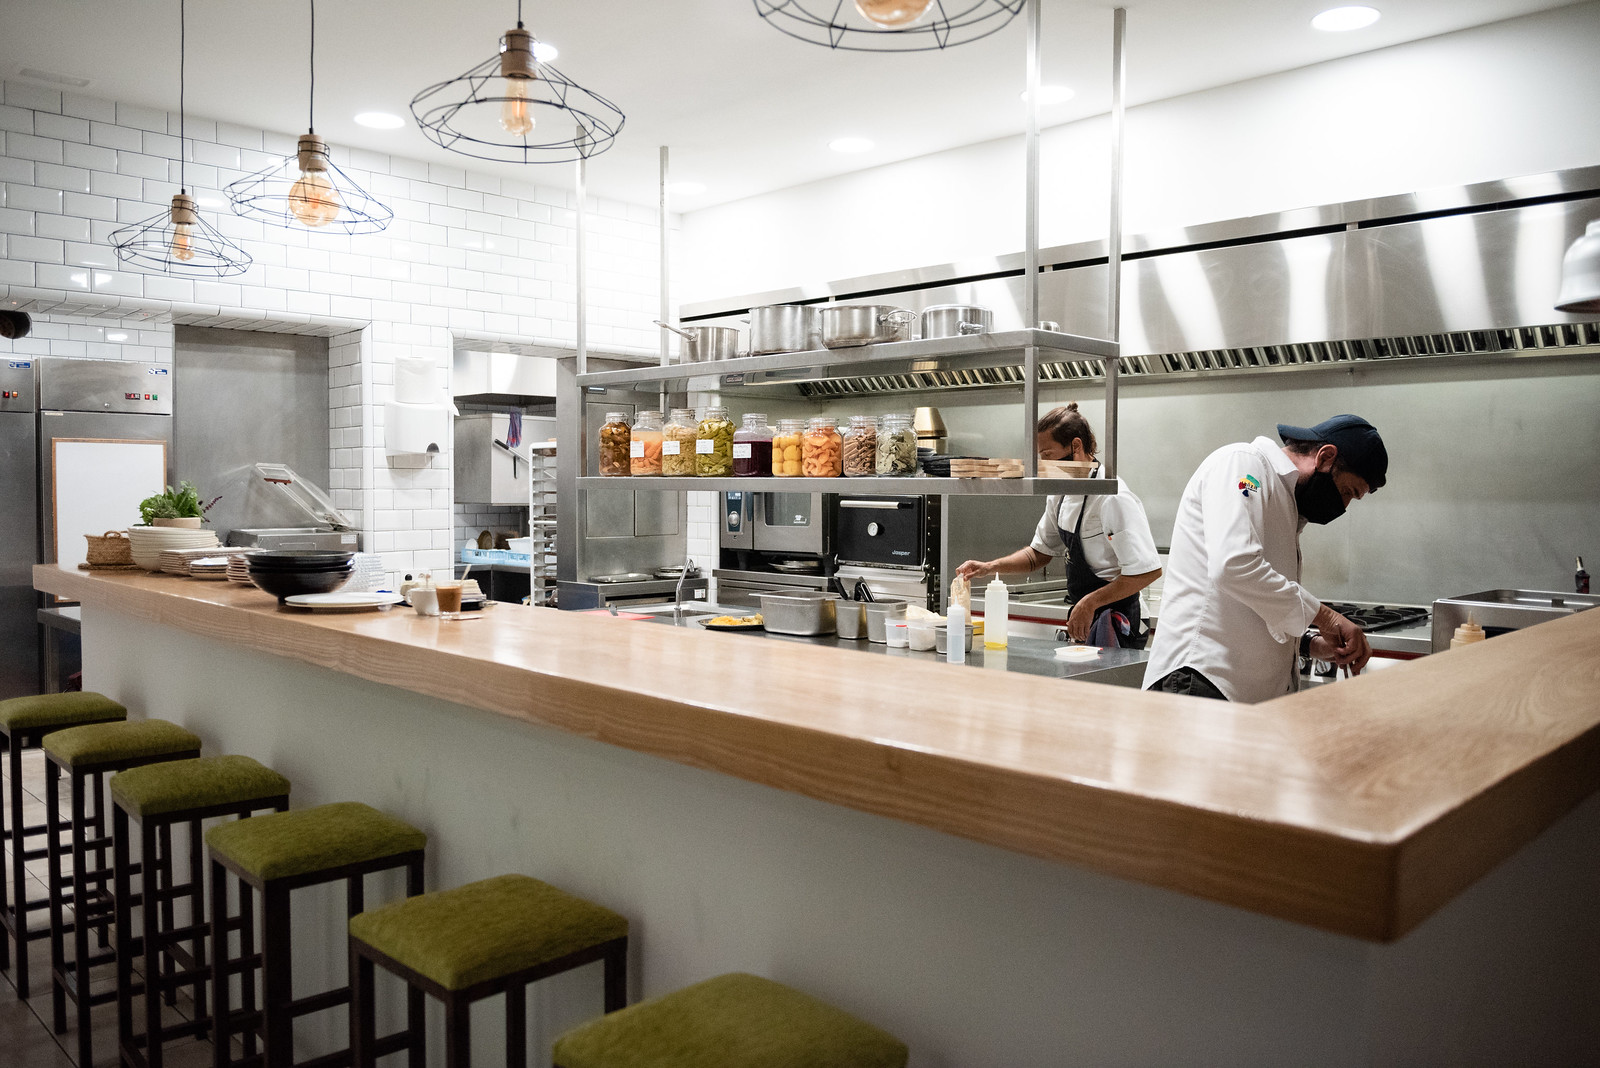 https://www.white-ibiza.com/wp-content/uploads/2020/11/cas-gasi-restaurant-2020-02.jpg